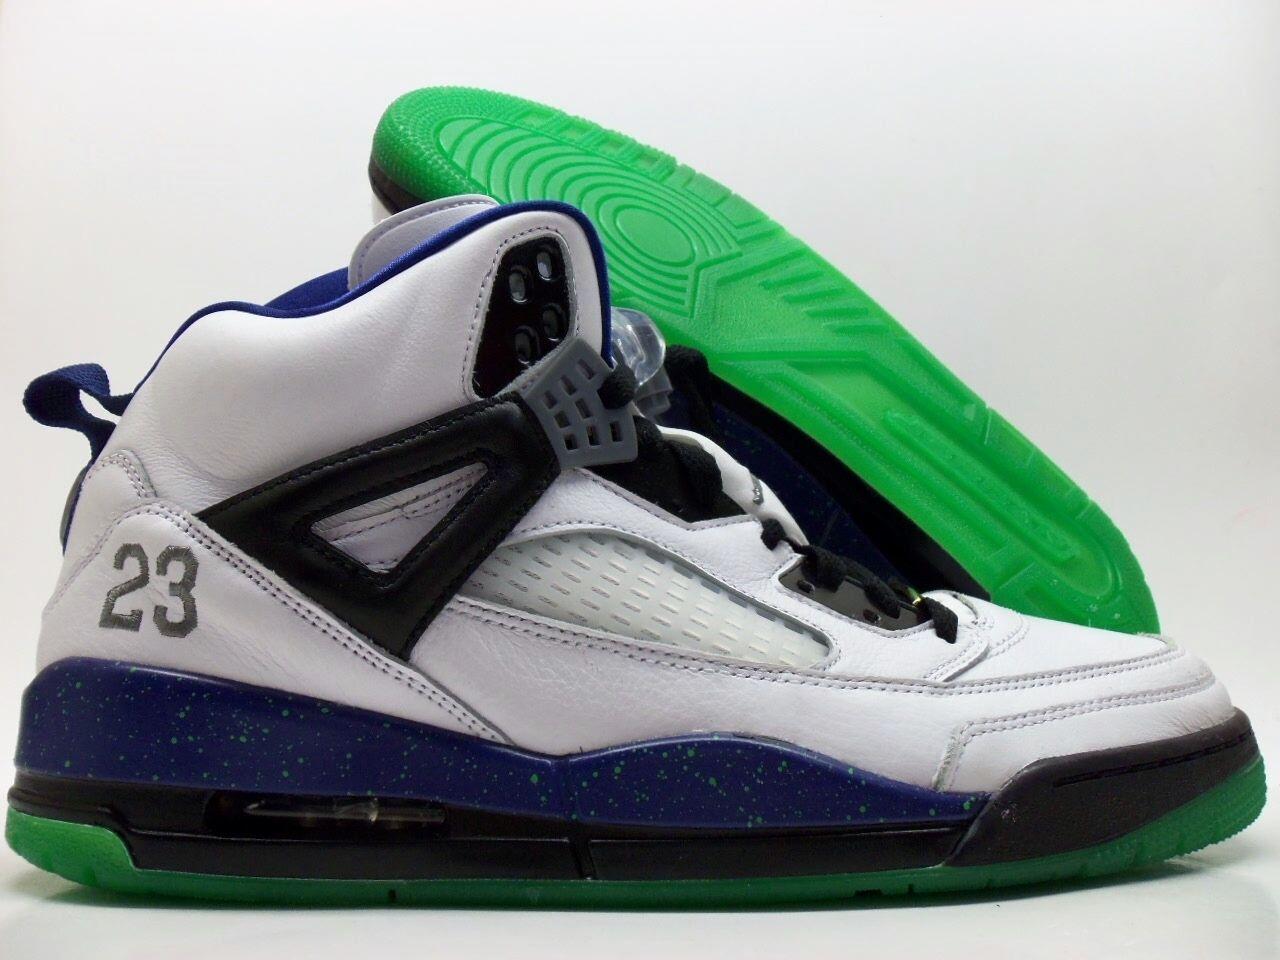 Nike air jordan nero-royal spizike id bianco / nero-royal jordan blu dimensioni uomini 13 [605236-971] 0f08ce